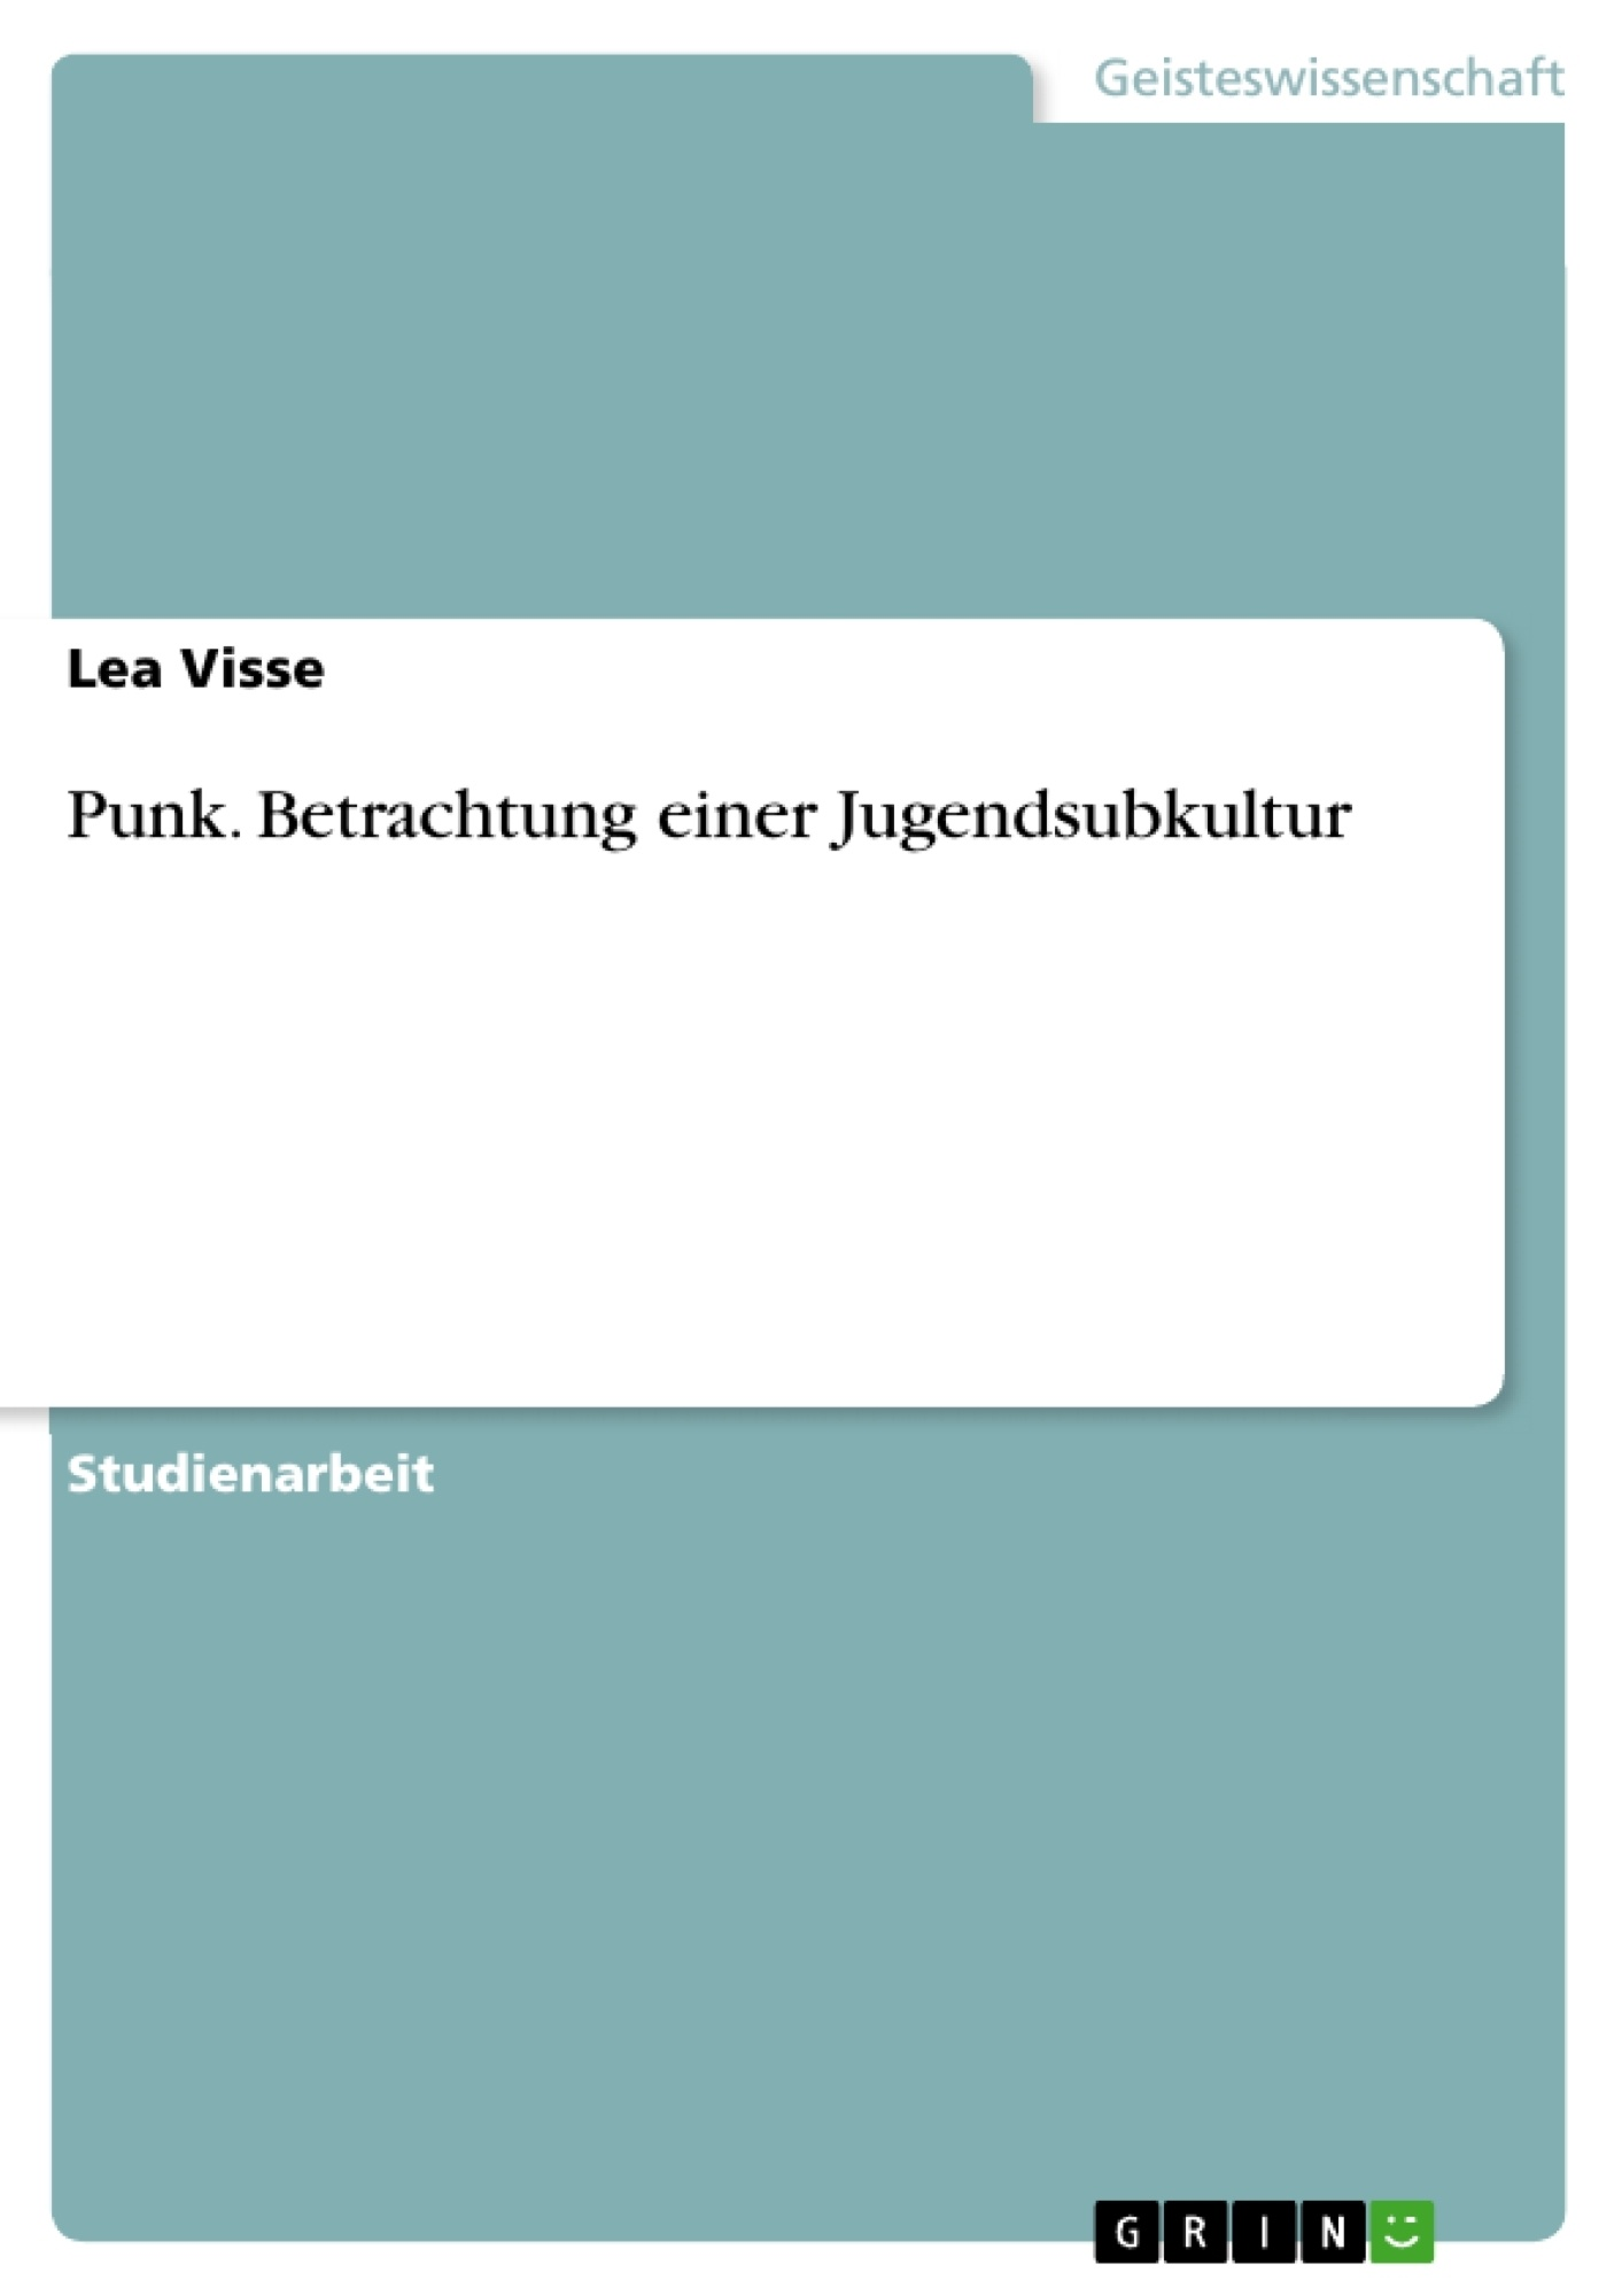 Titel: Punk. Betrachtung einer Jugendsubkultur